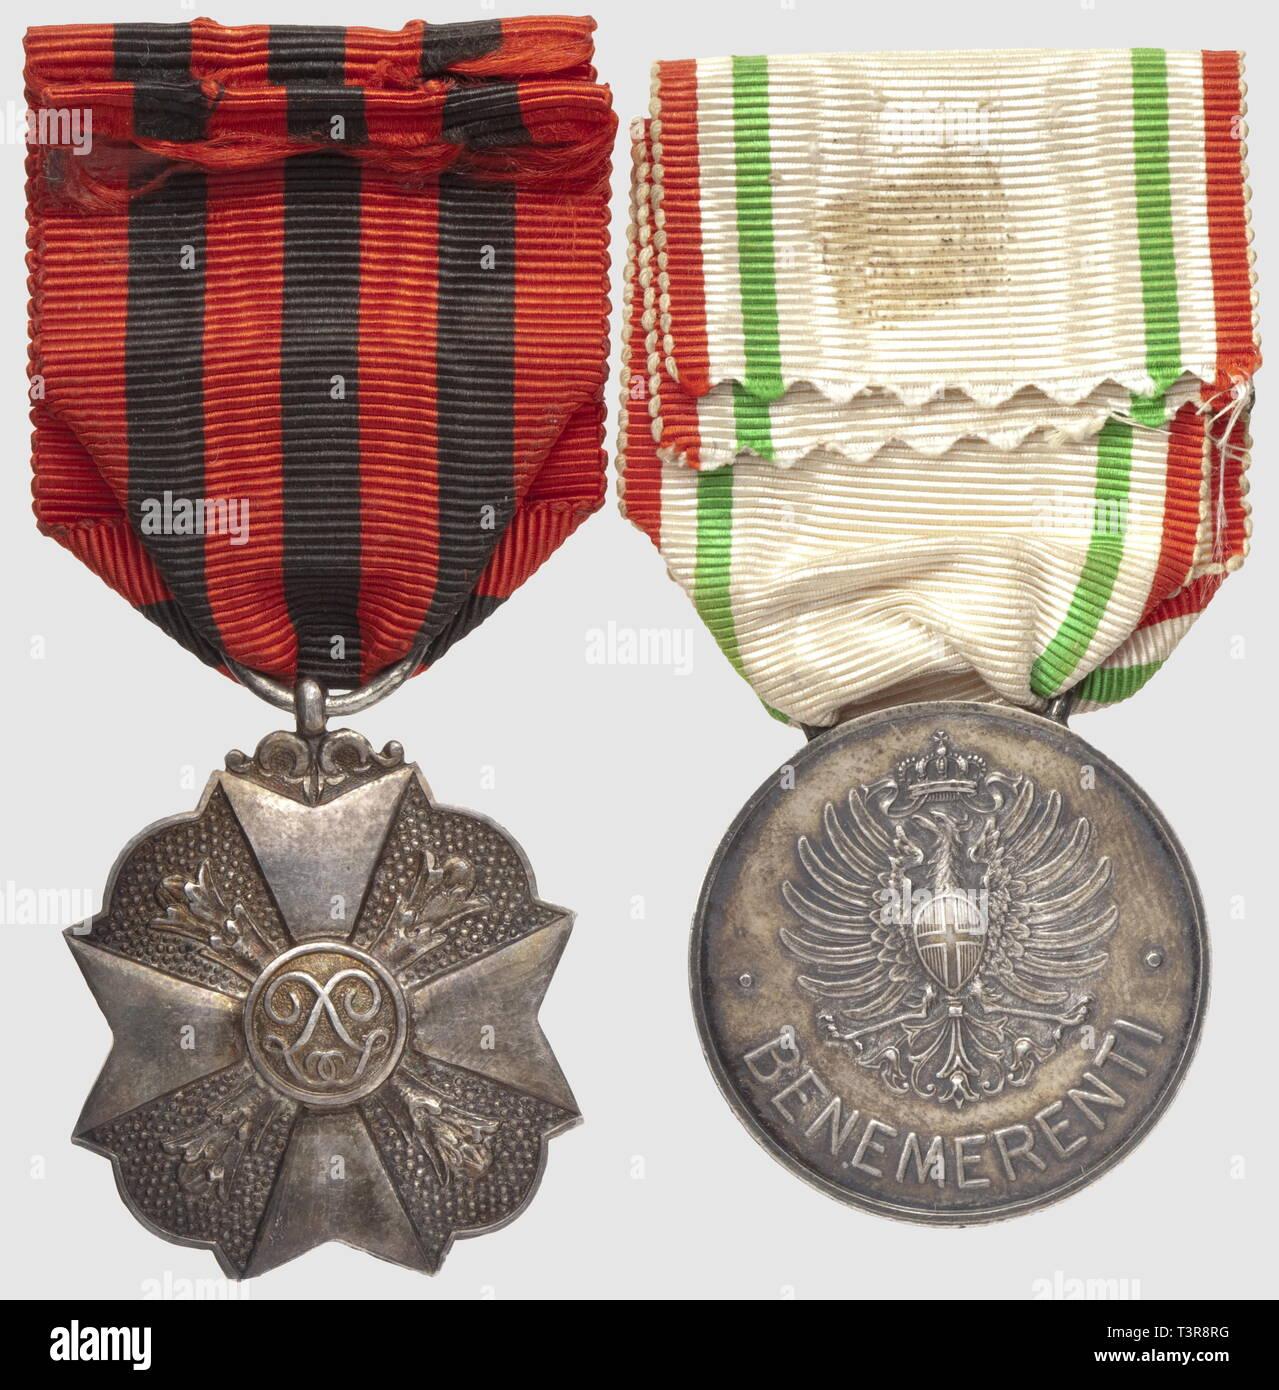 "Médaille de la 'Croce Rossa Italiana, ""Benemerenti' en argent, avec sa rara barrette 'Campagna Italo-Austriaca 1915-16"", Additional-Rights-Clearance-Info-Not-Available Imagen De Stock"